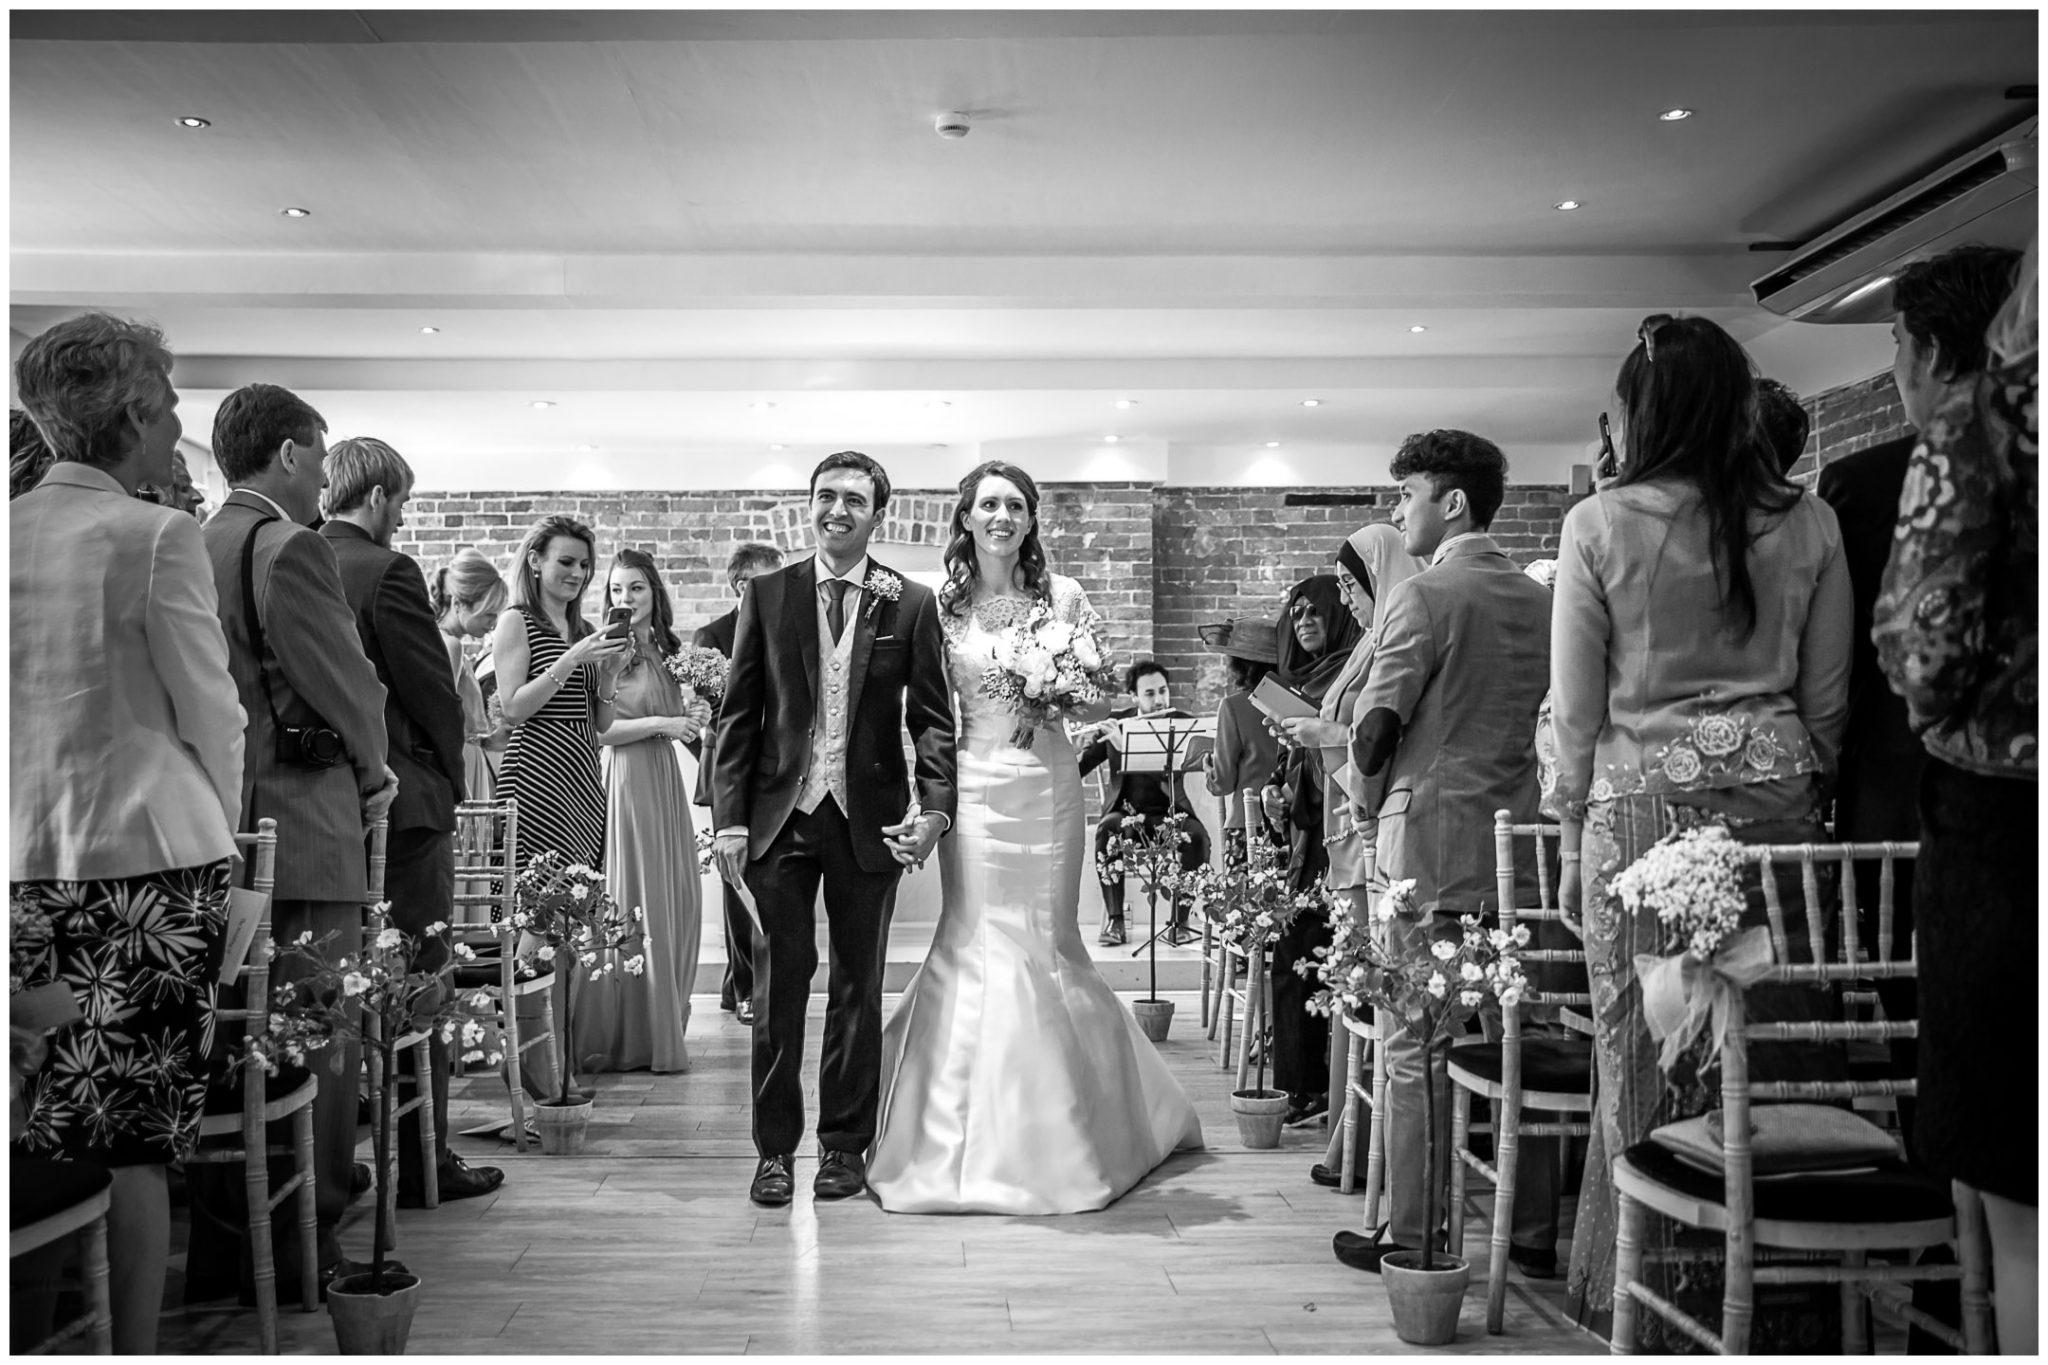 Sopley Mill Summer wedding bride and groom walk down the aisle